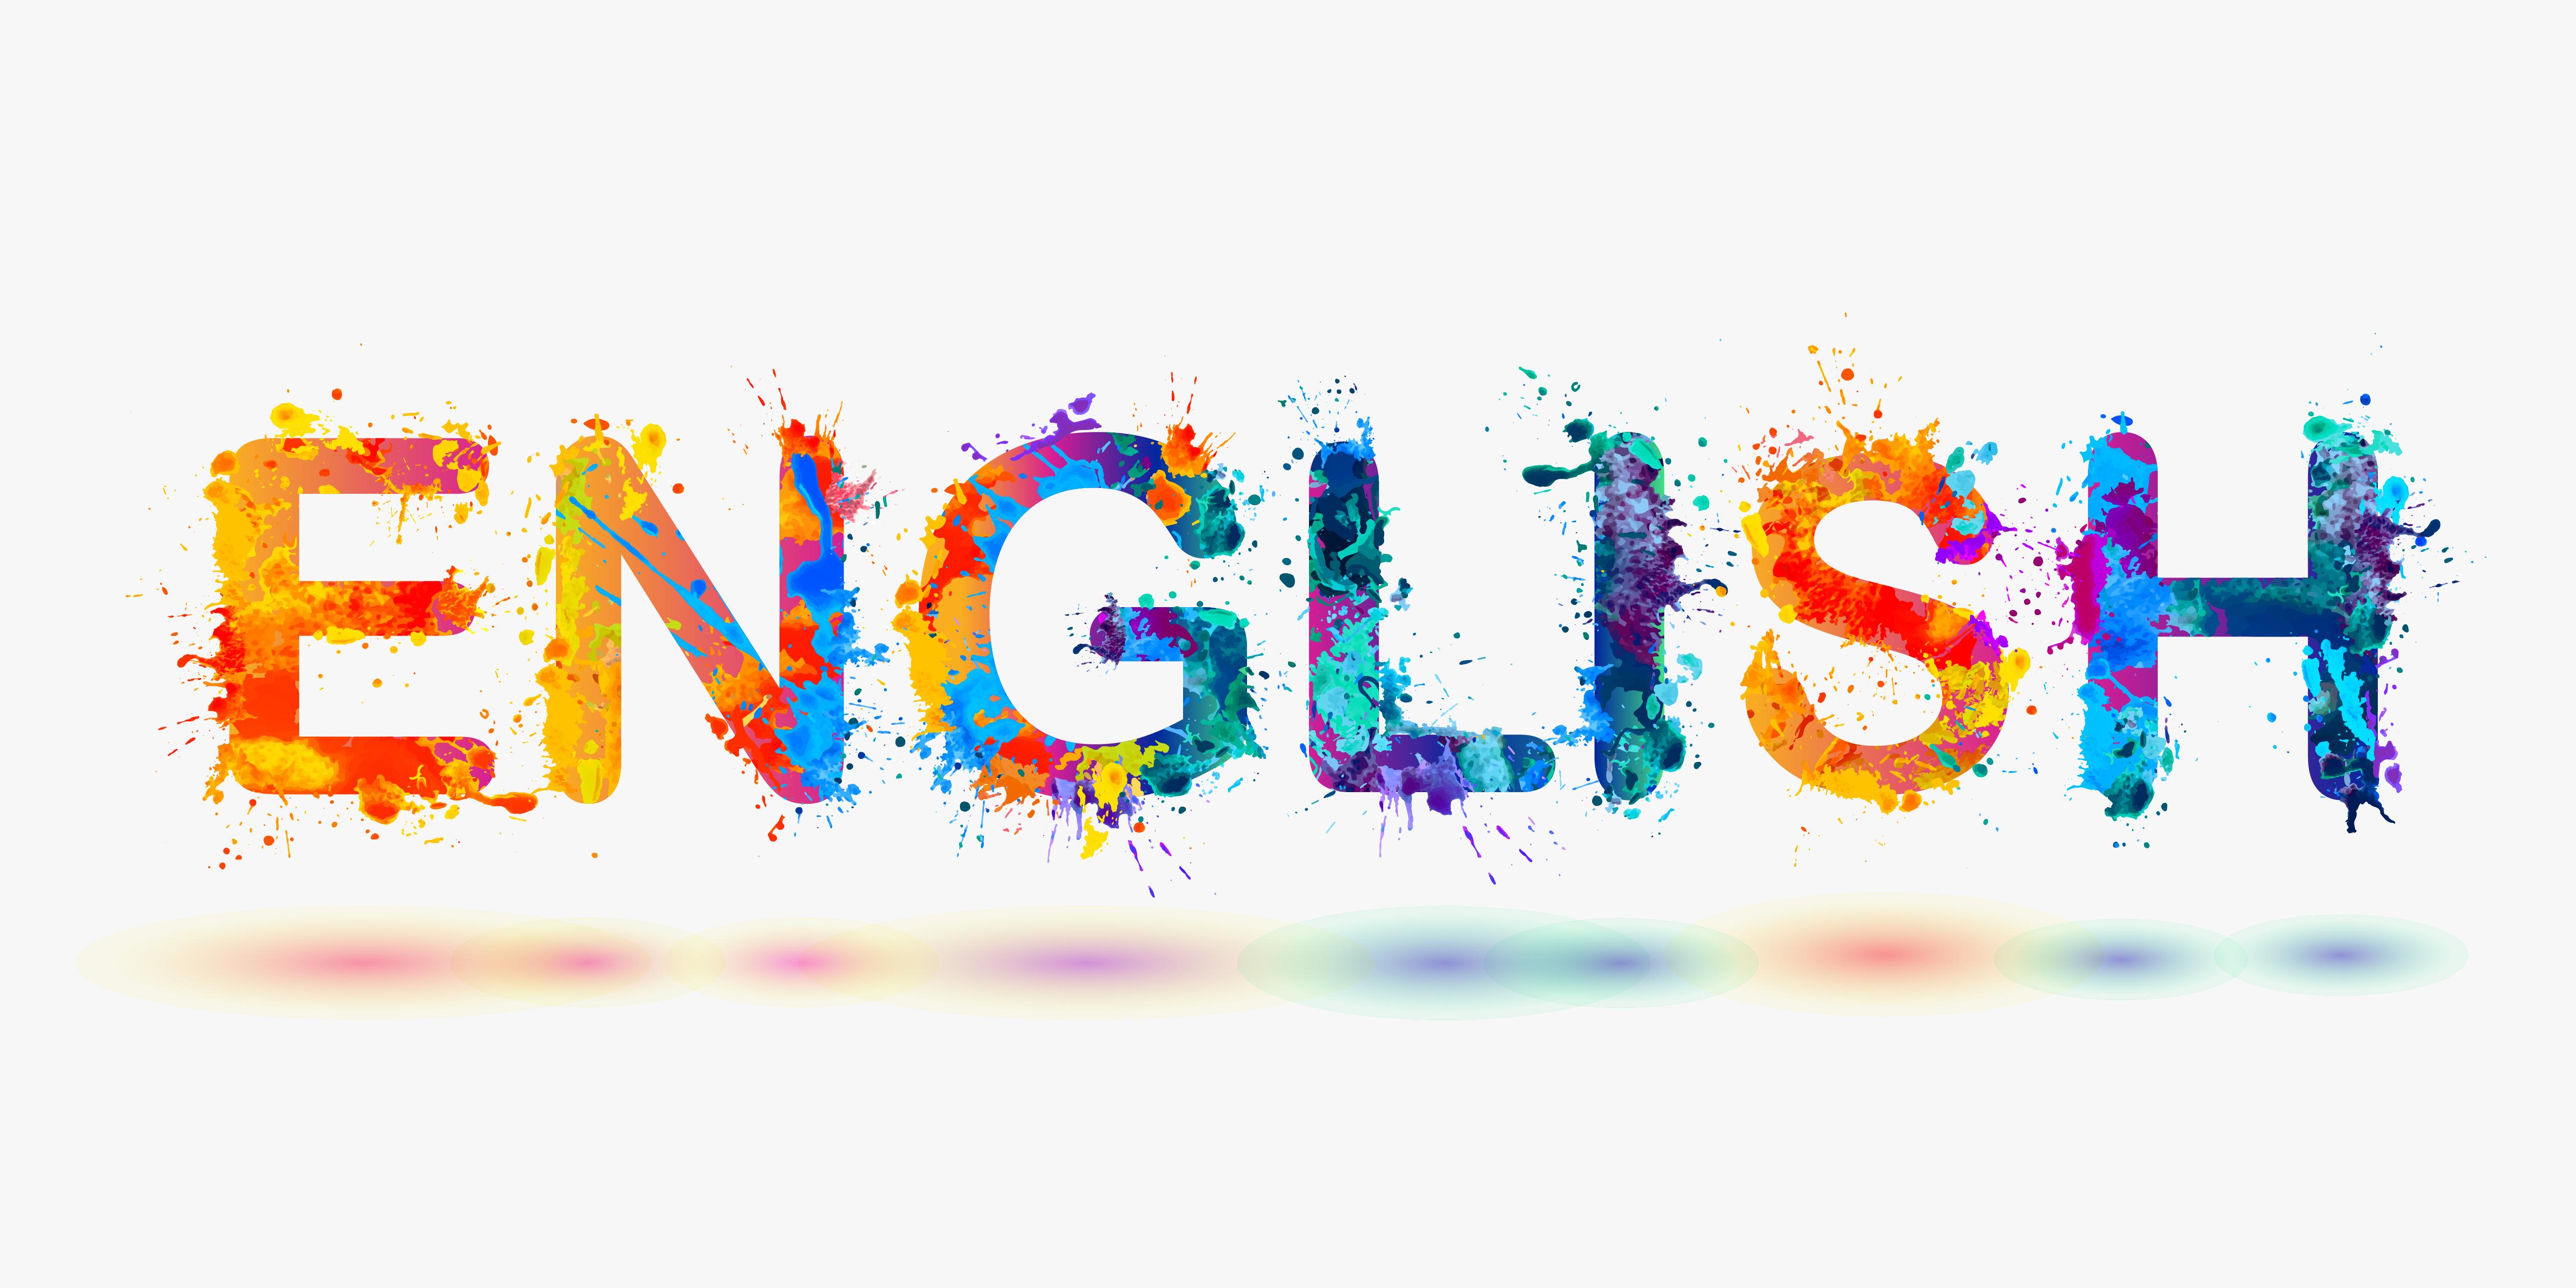 Common English Dictionary Vocabulary Words